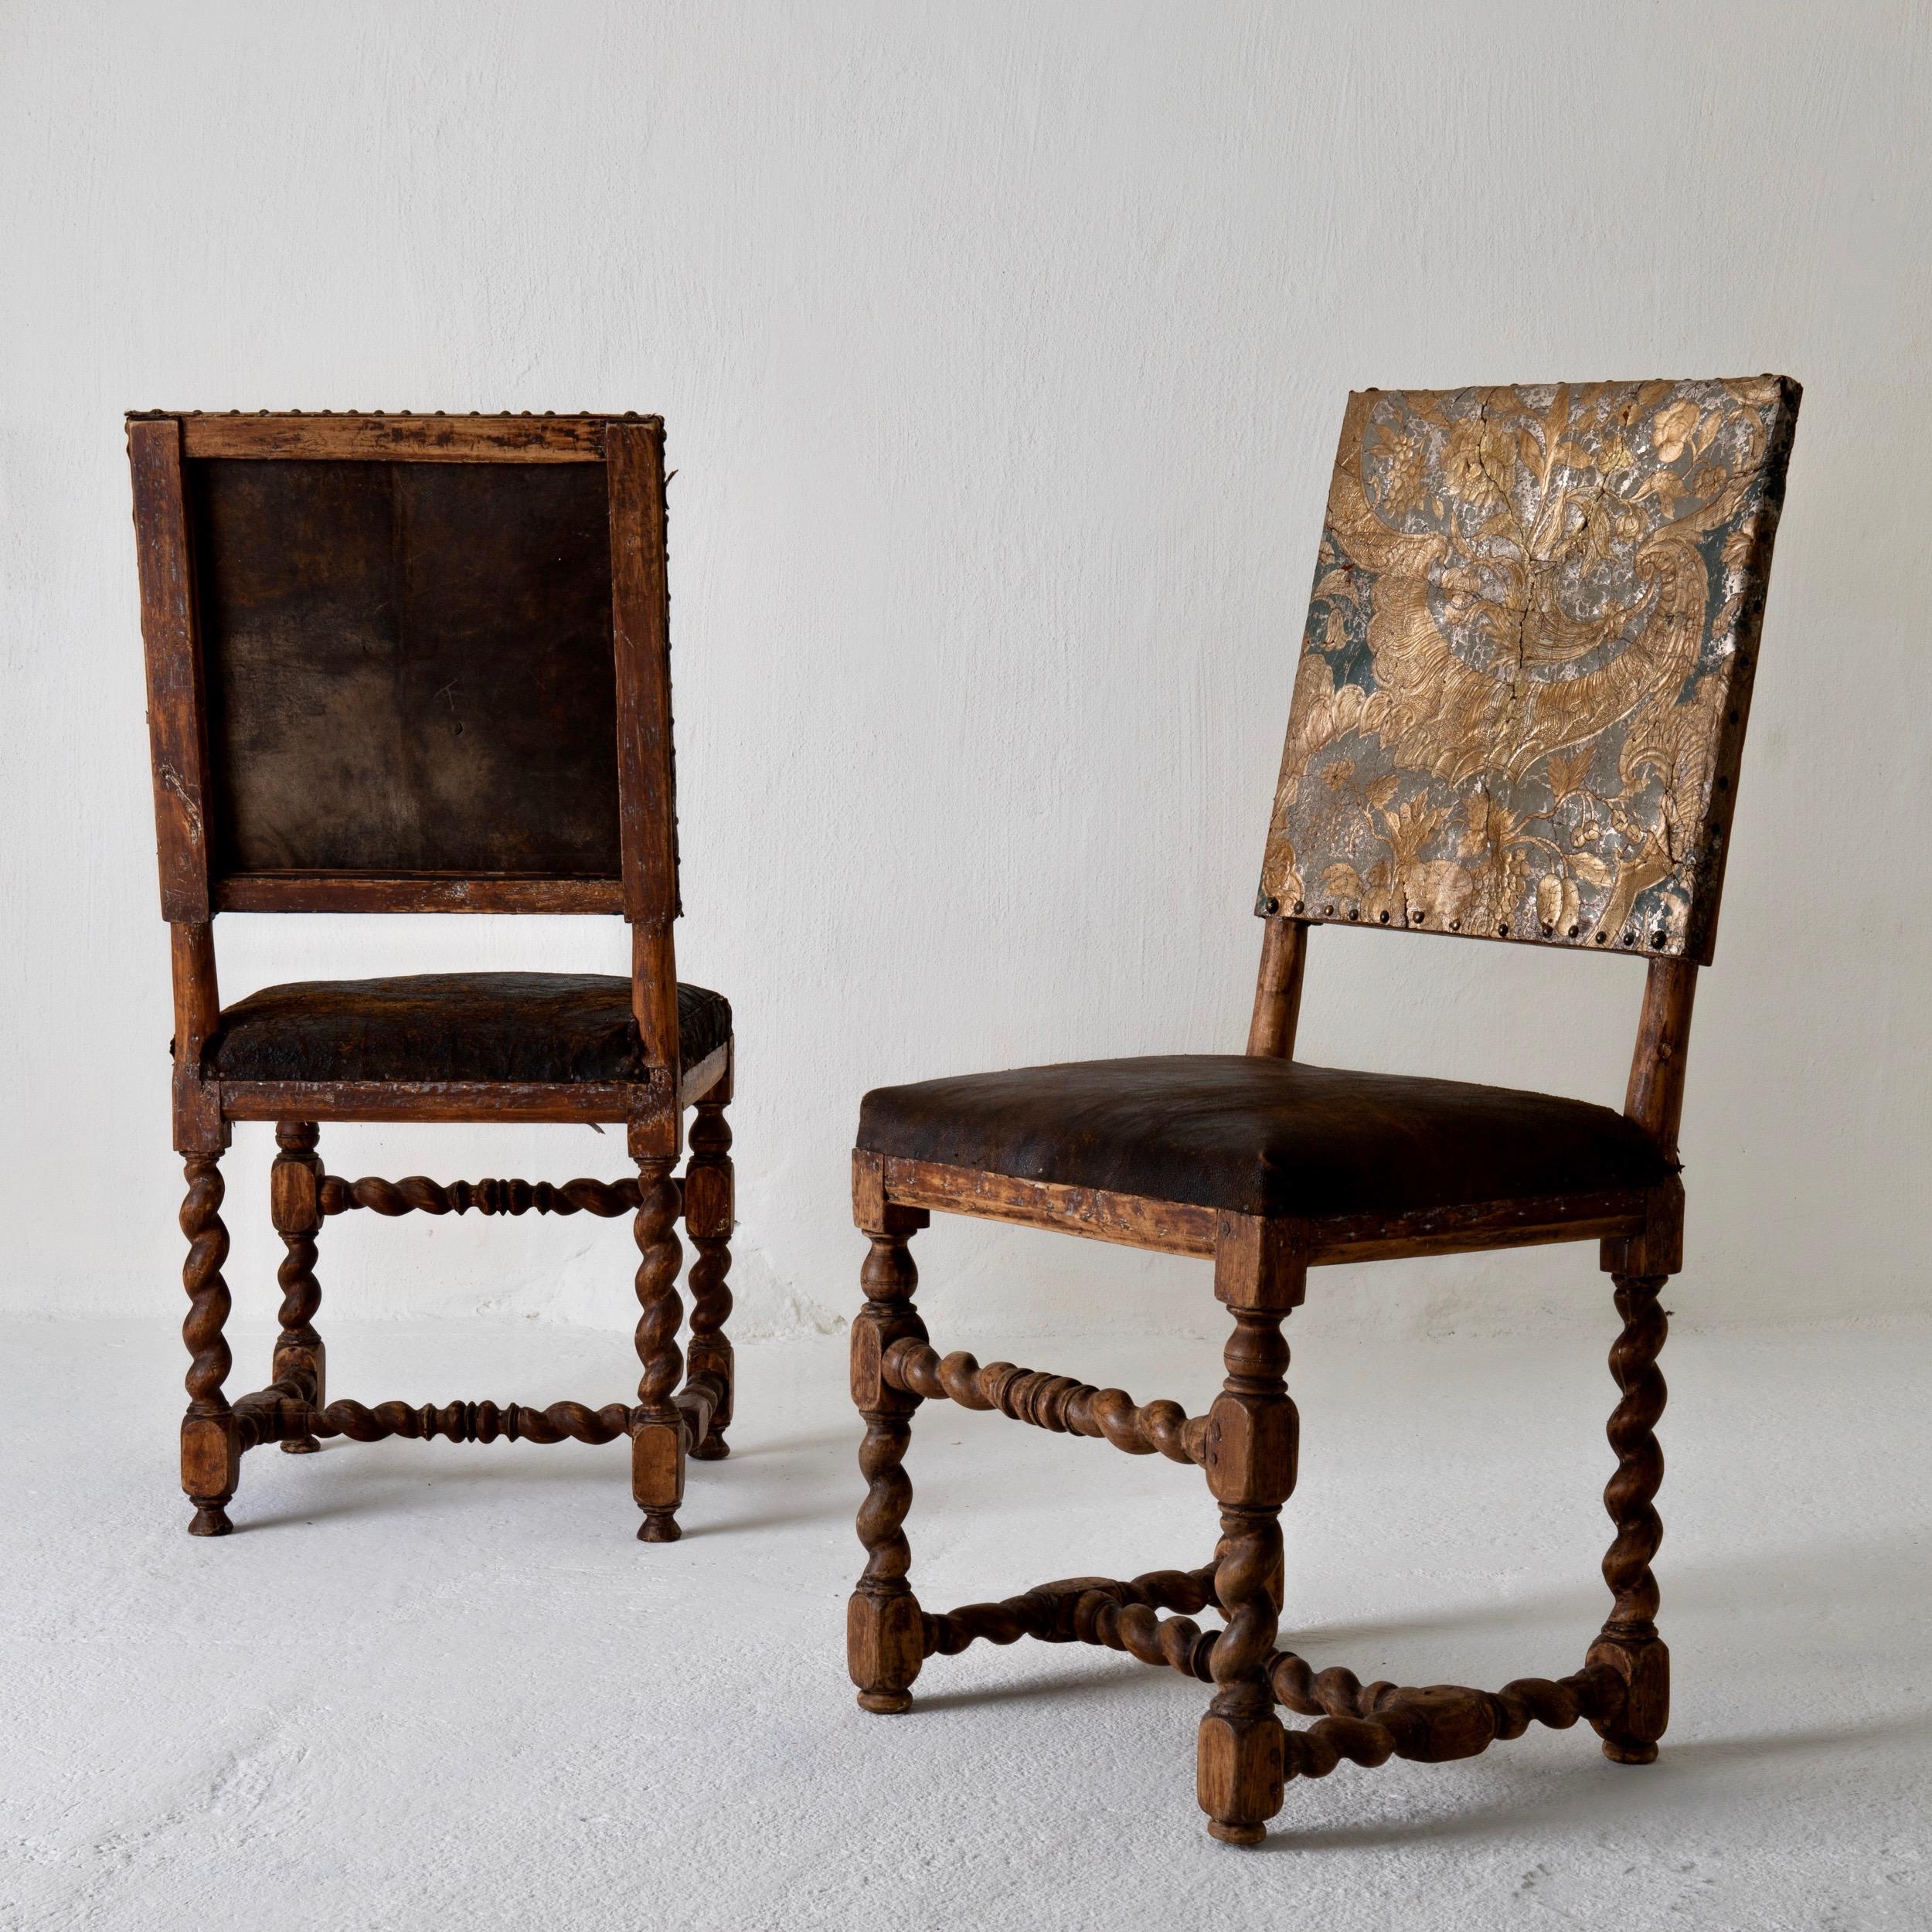 Chairs Pair Swedish Baroque 18th Century Sweden U2014 L A S E R O W